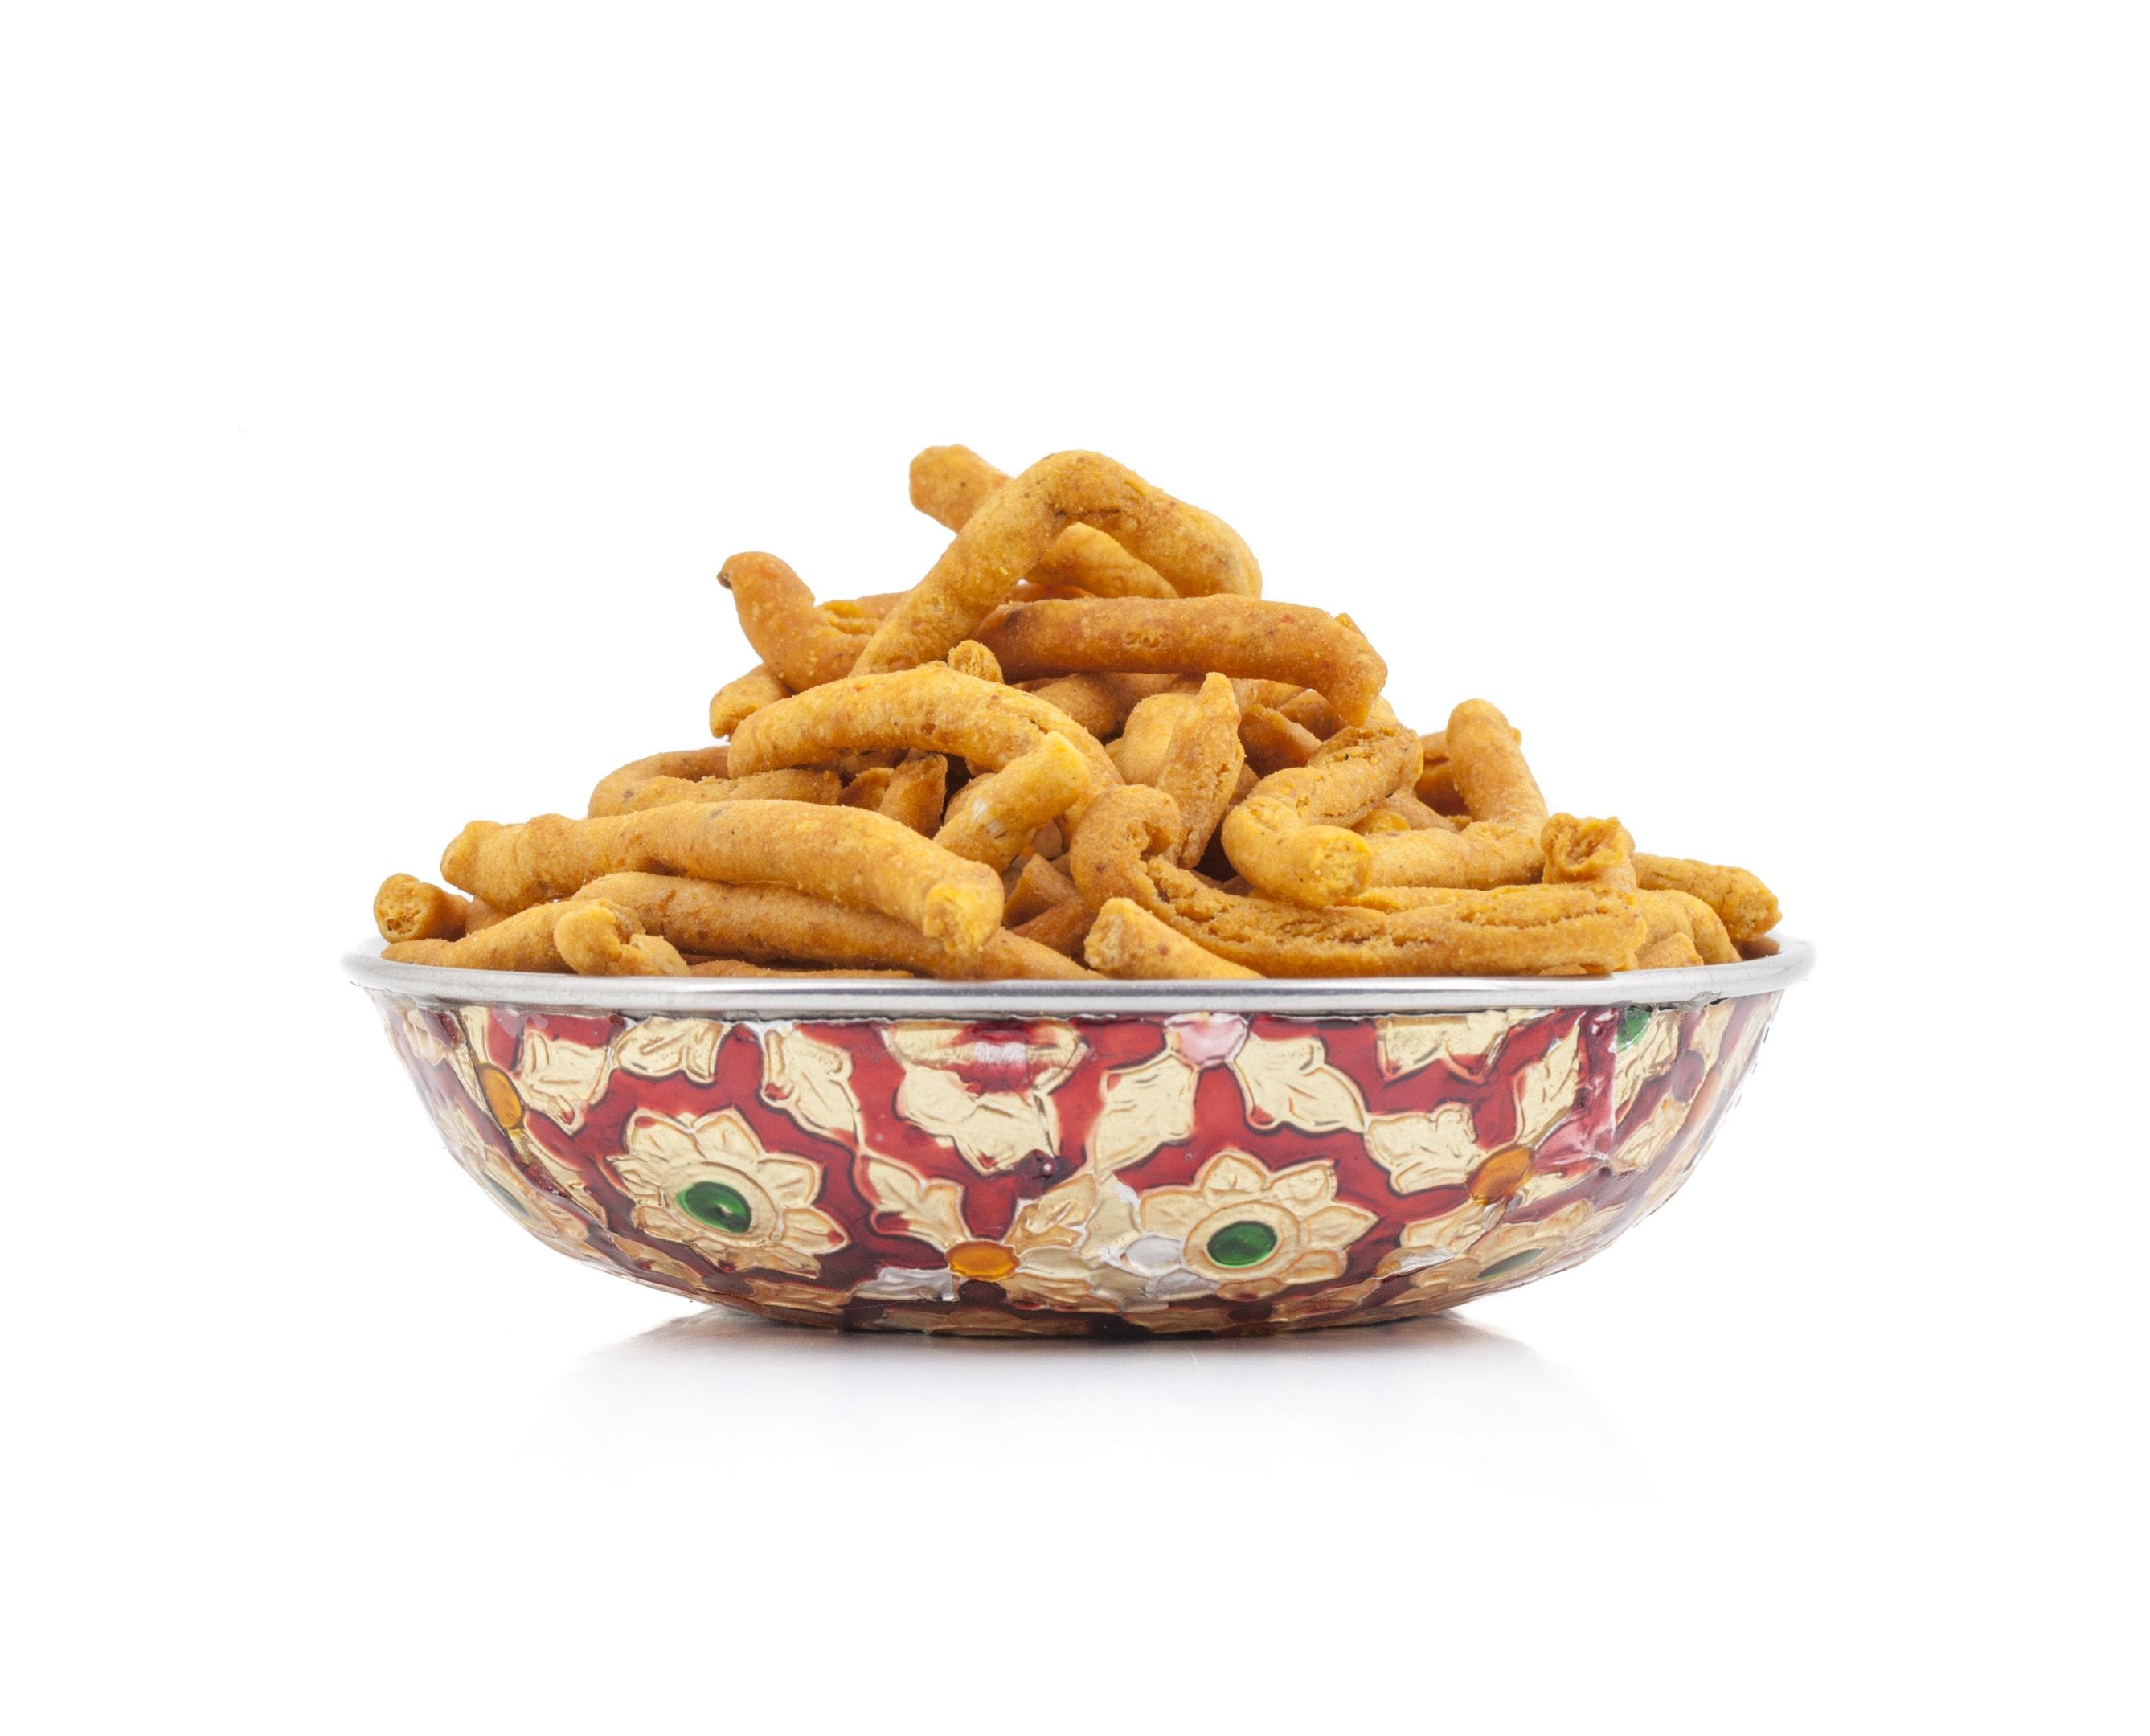 Kuli Kuli — West African snack